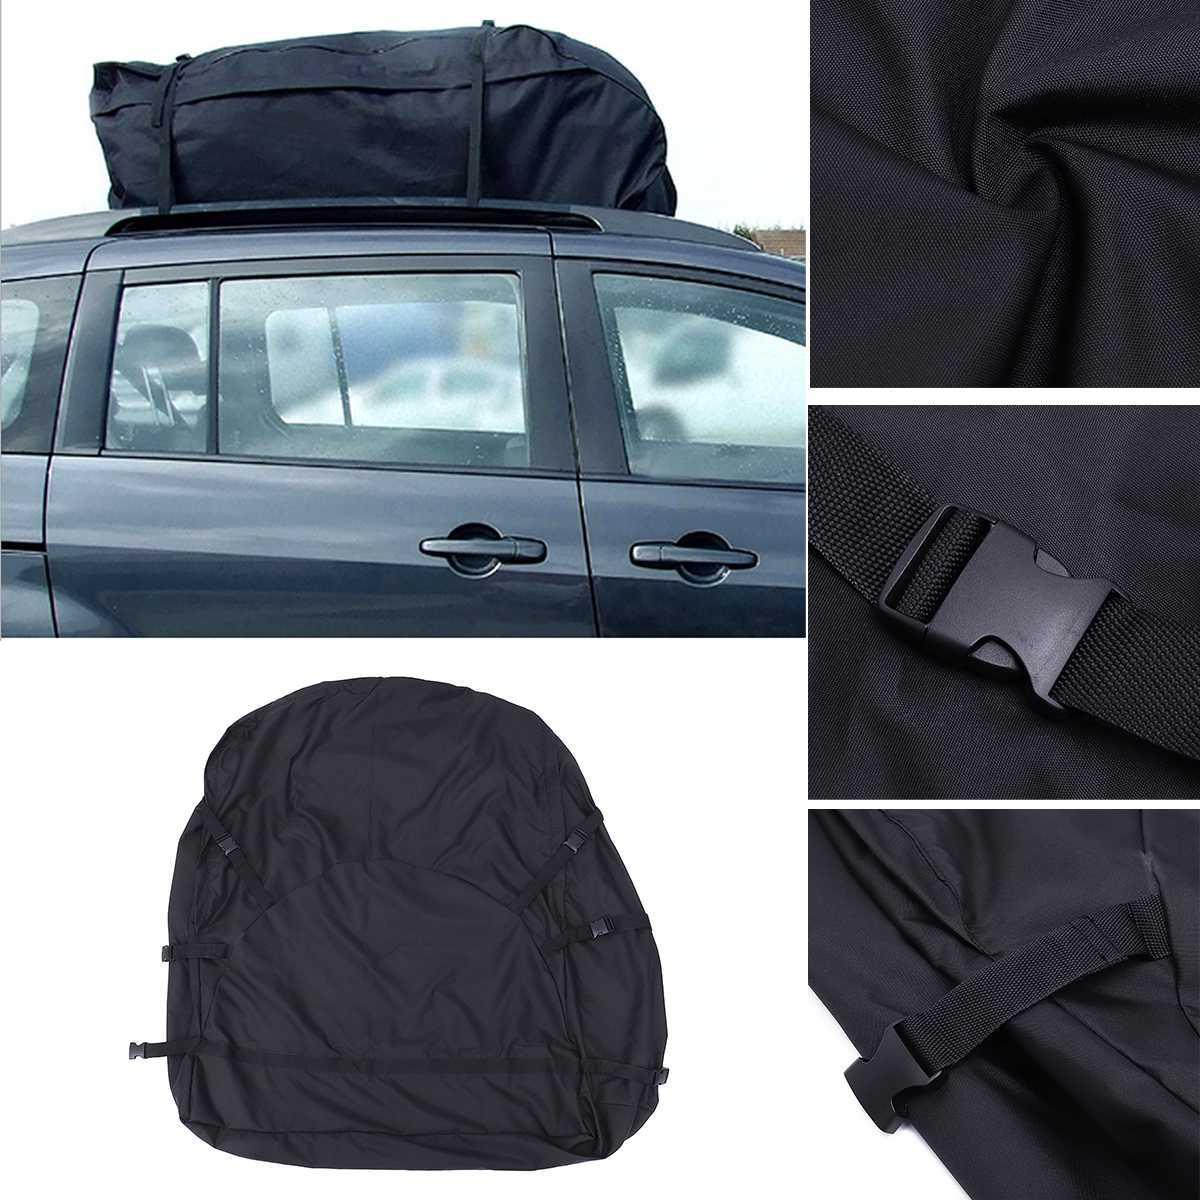 130x100x45cm Car Top Bag <font><b>Rack</b></font> Carrier Storage Waterproof Van